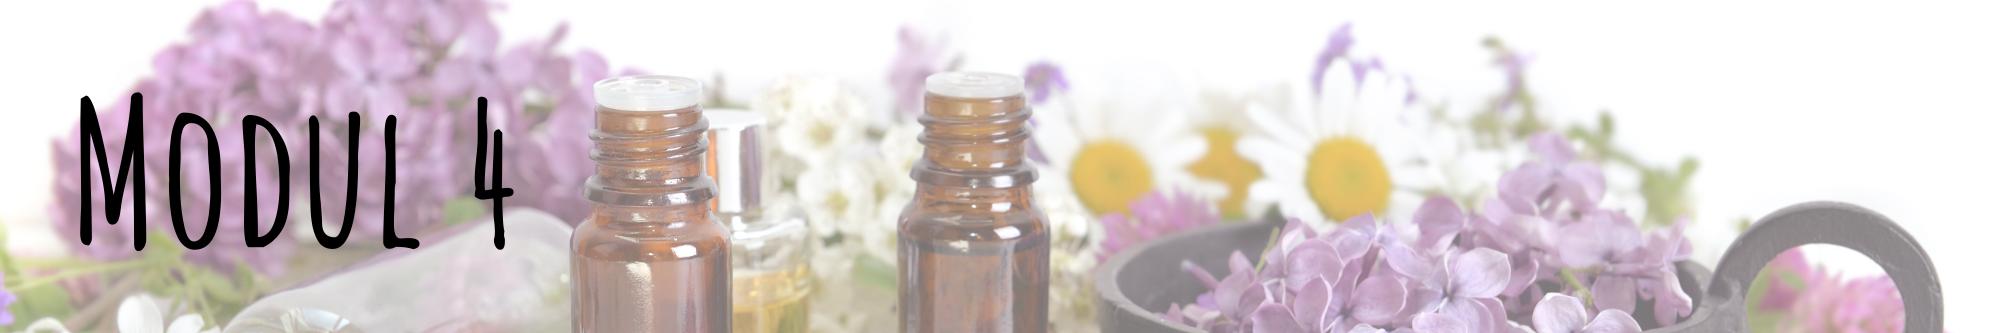 Aromaterapeut uddannelse